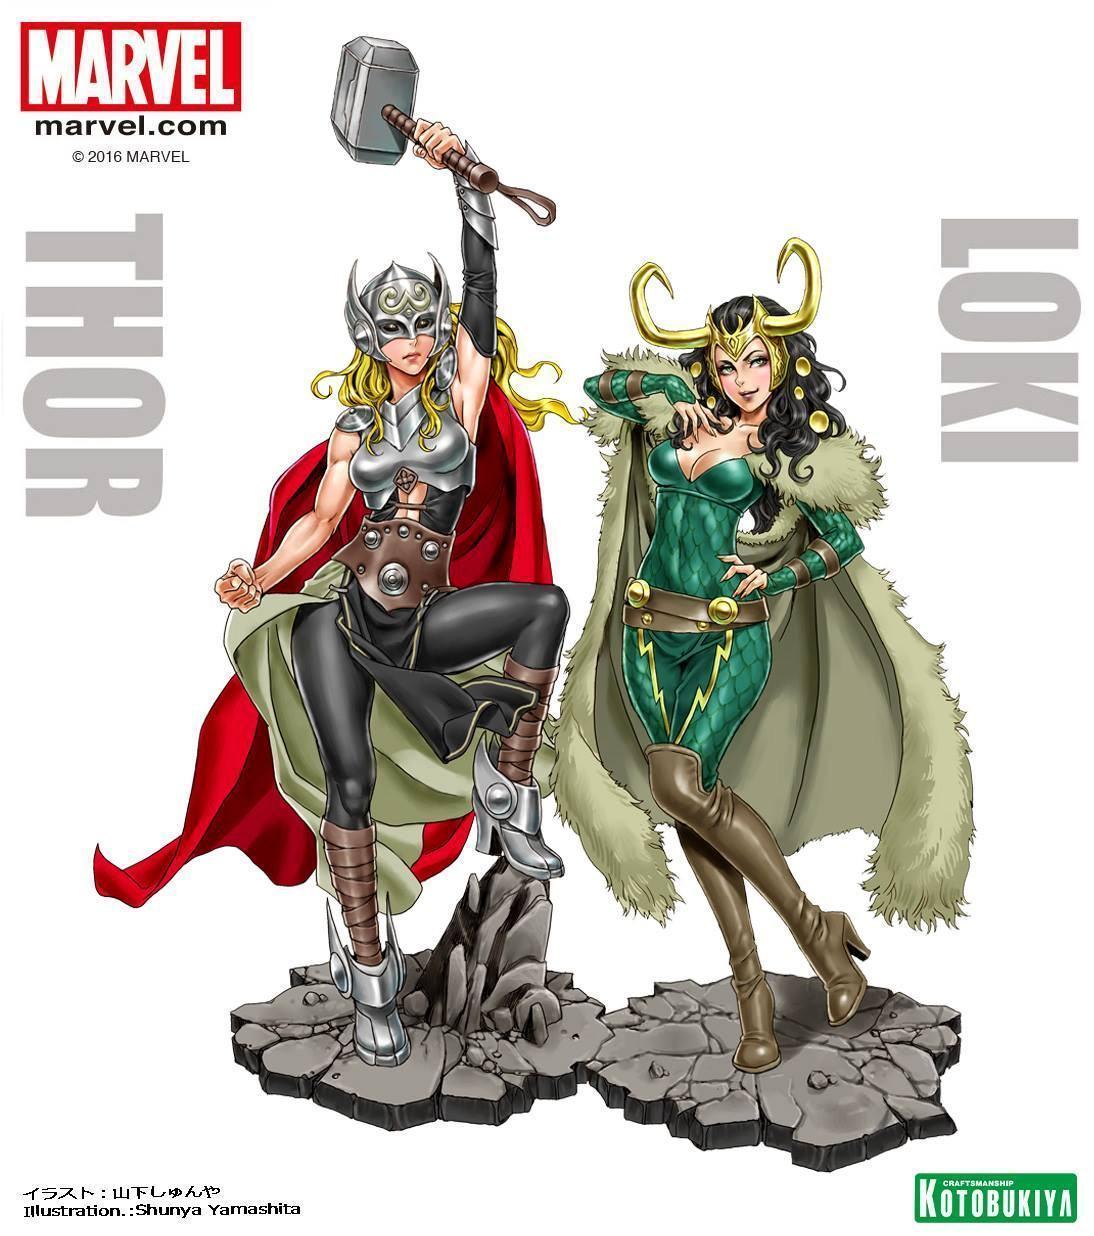 Marvel-Lady-Loki-Bishoujo-Statue-07